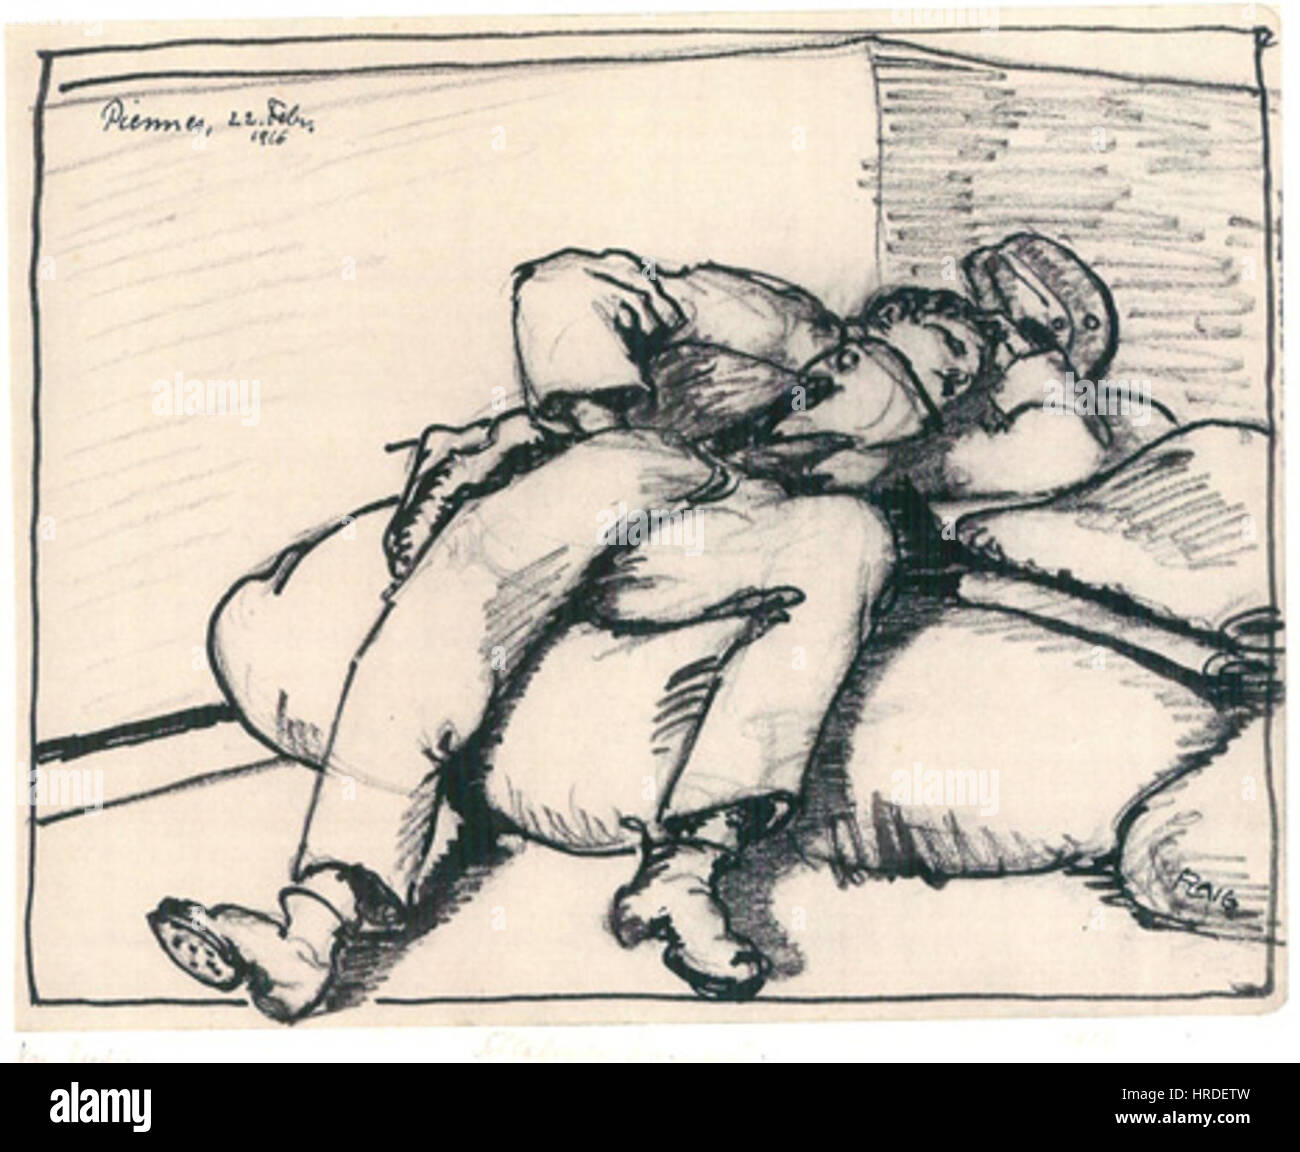 Flaig Kriegstagebuch Blatt 11 Schlafender Kamerad 1916 - Stock Image